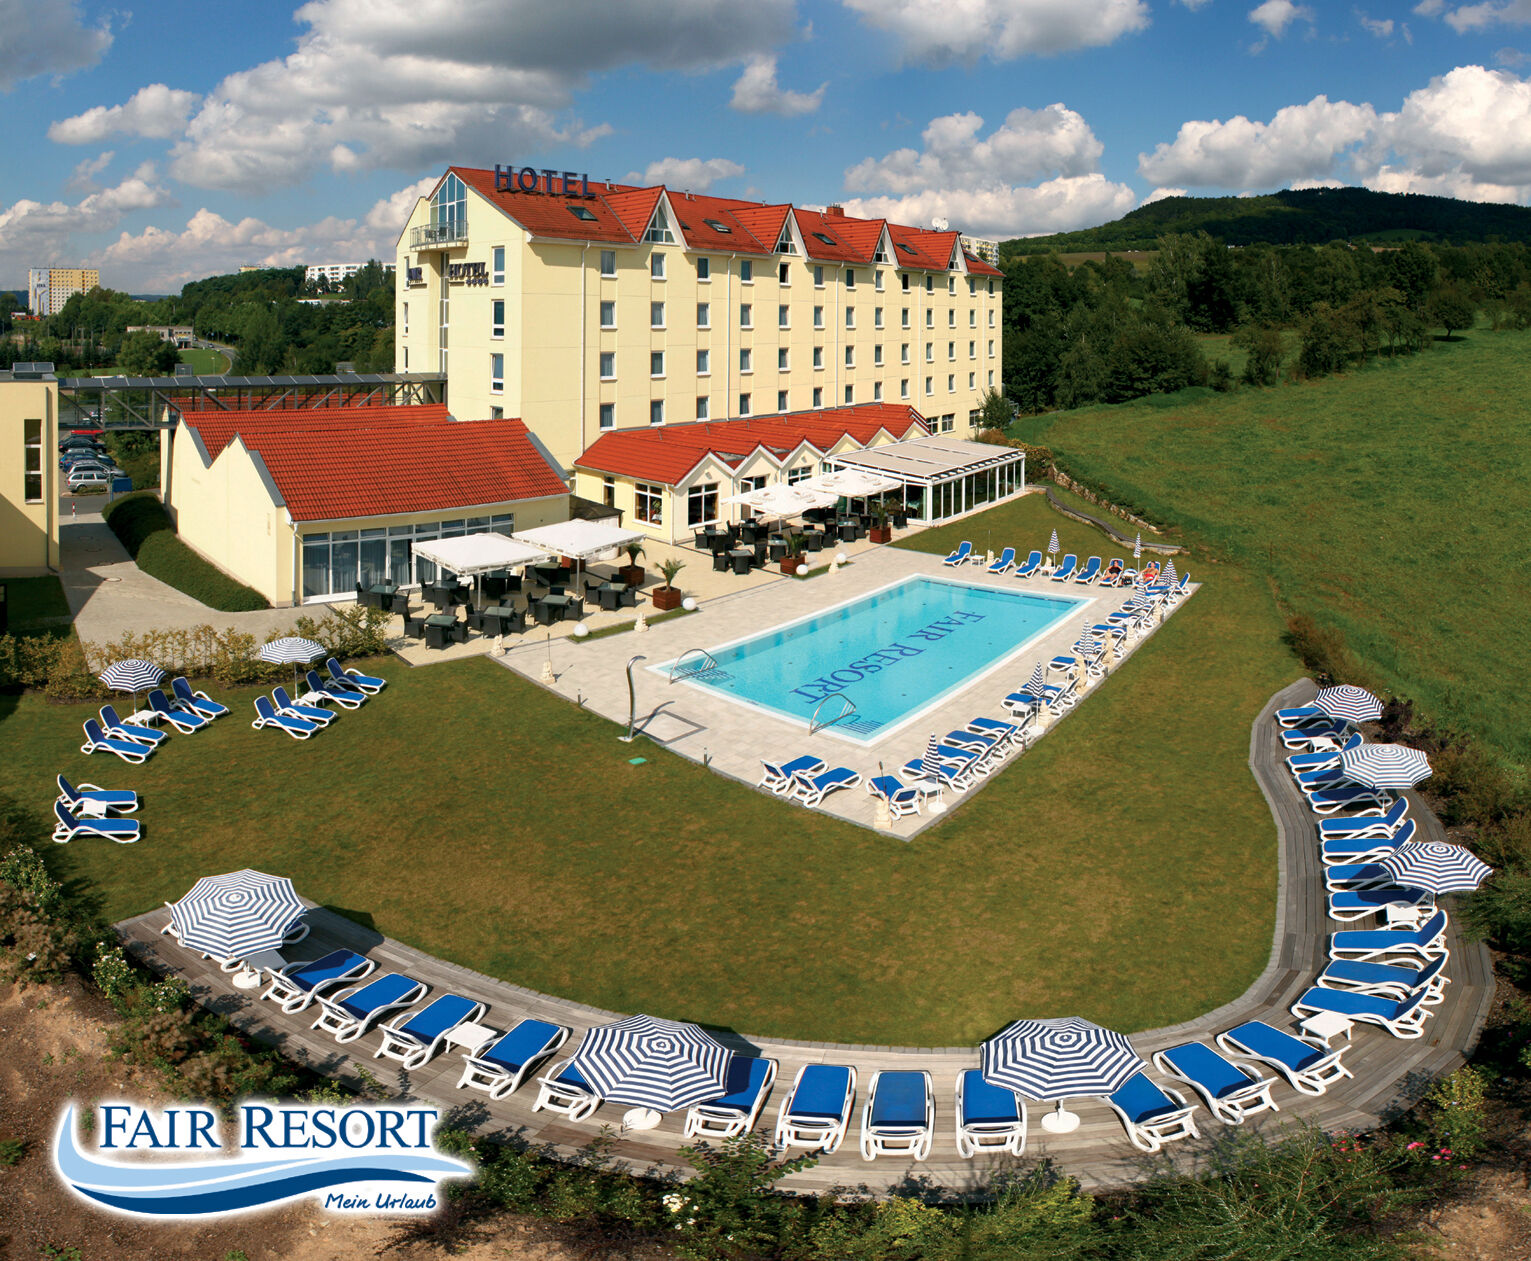 Fair Resort Hotel Jena Ebay